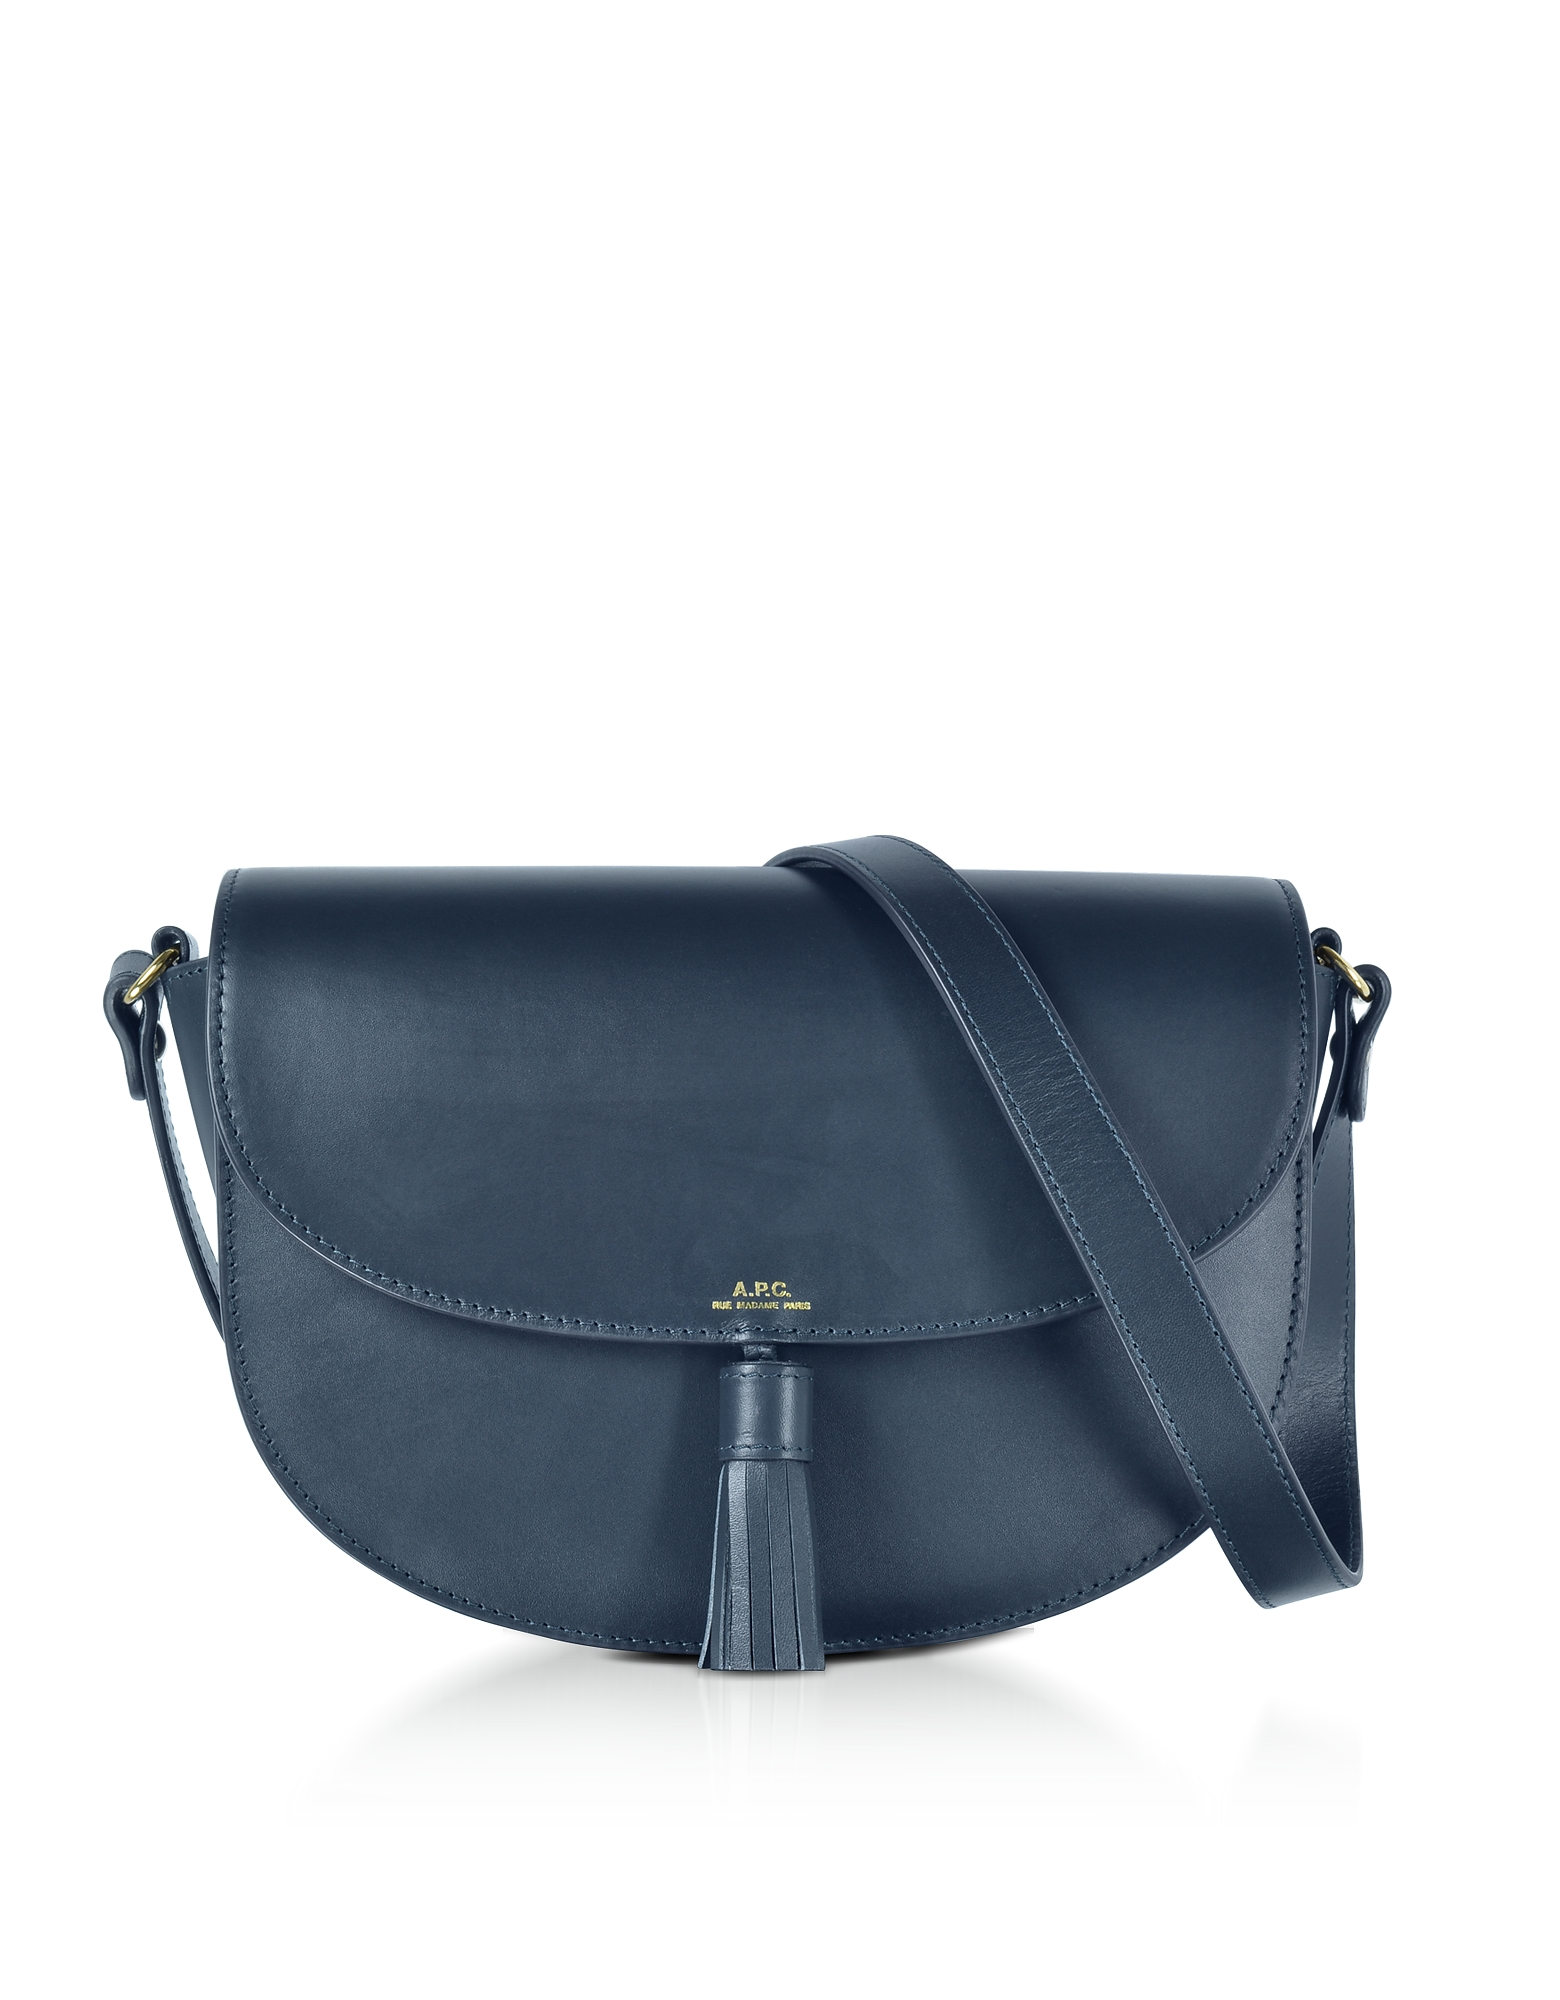 A.P.C. Handbags, Diane Dark Navy Leather Crossbody Bag